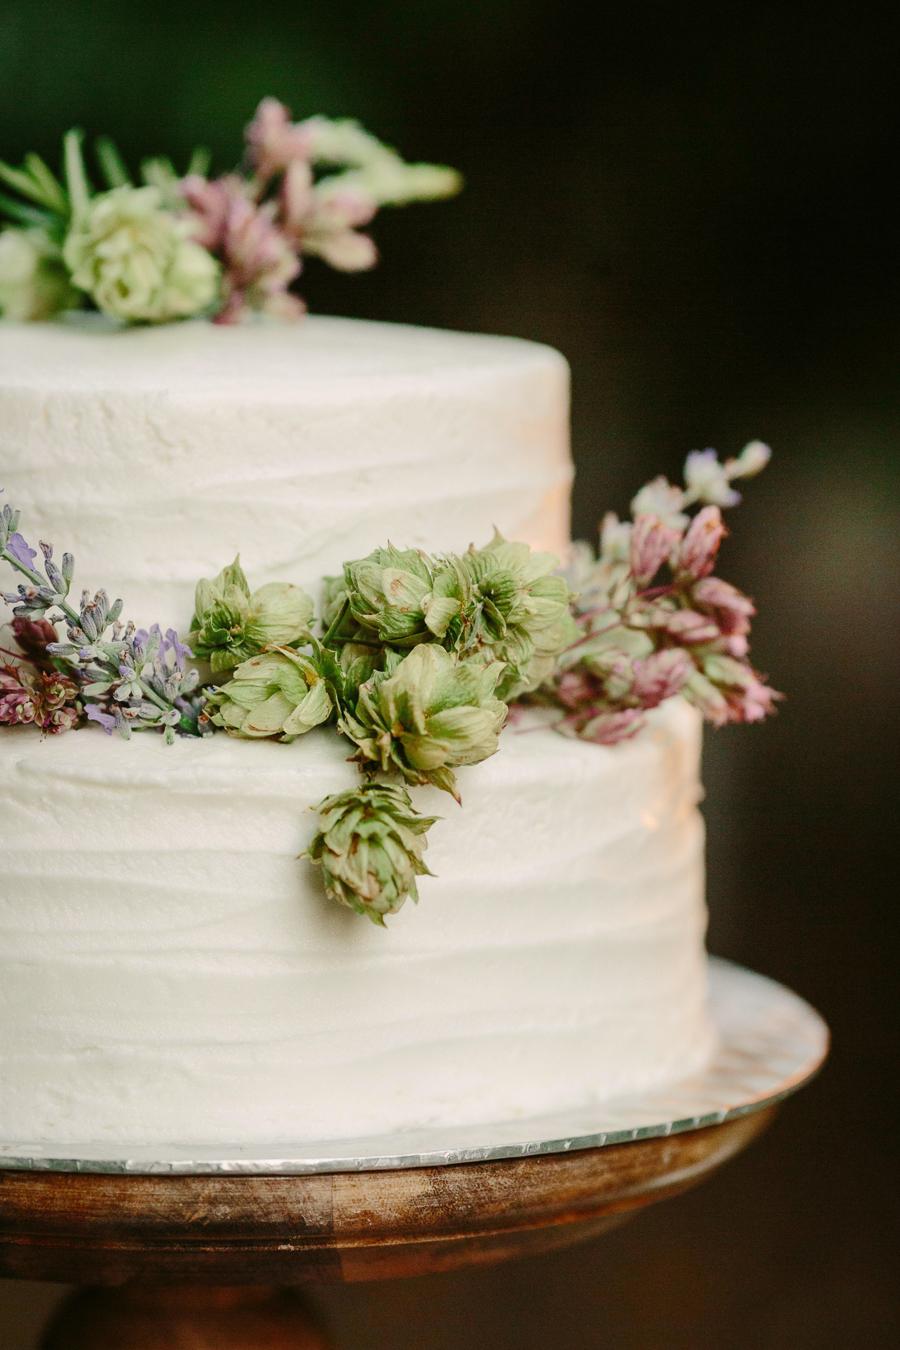 Bespoke Cakery wedding cakes in Grand Junction & Palisade, Colorado / photo: Cat Mayer Studio